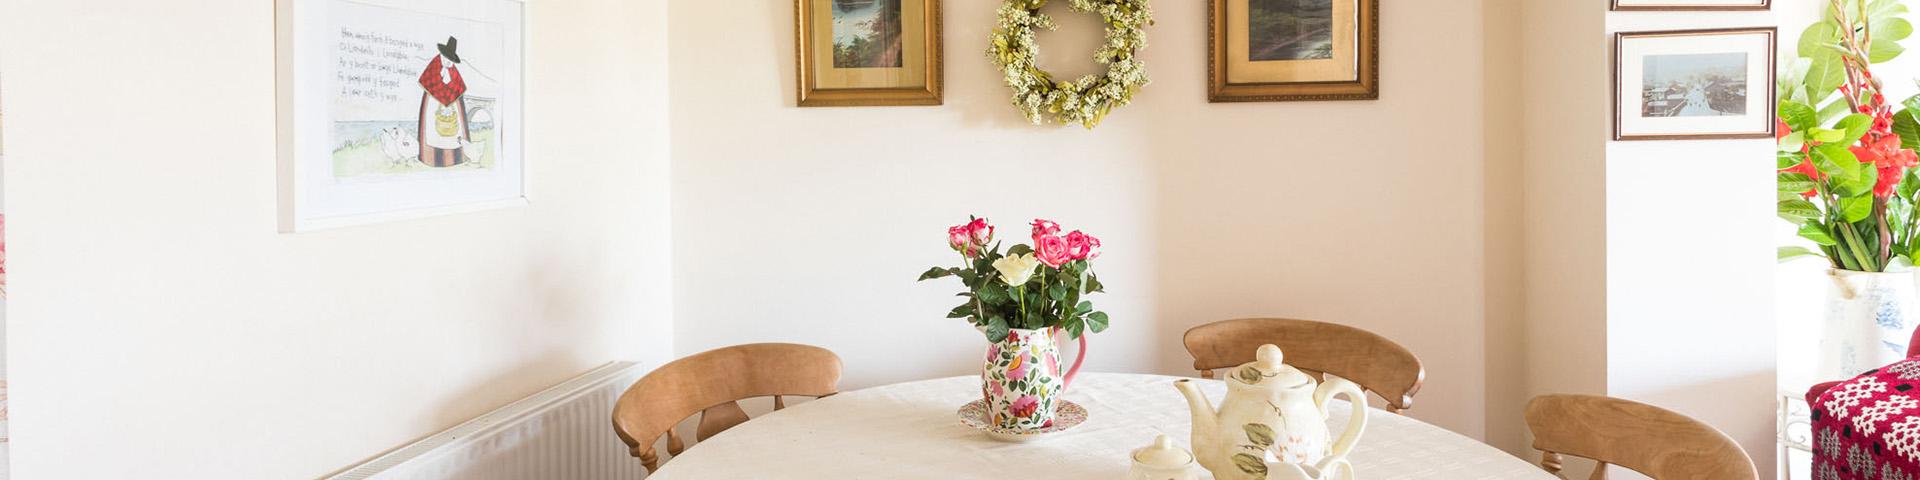 quiet getaways for couples uk, romantic getaways wales, brecon beacons cottages